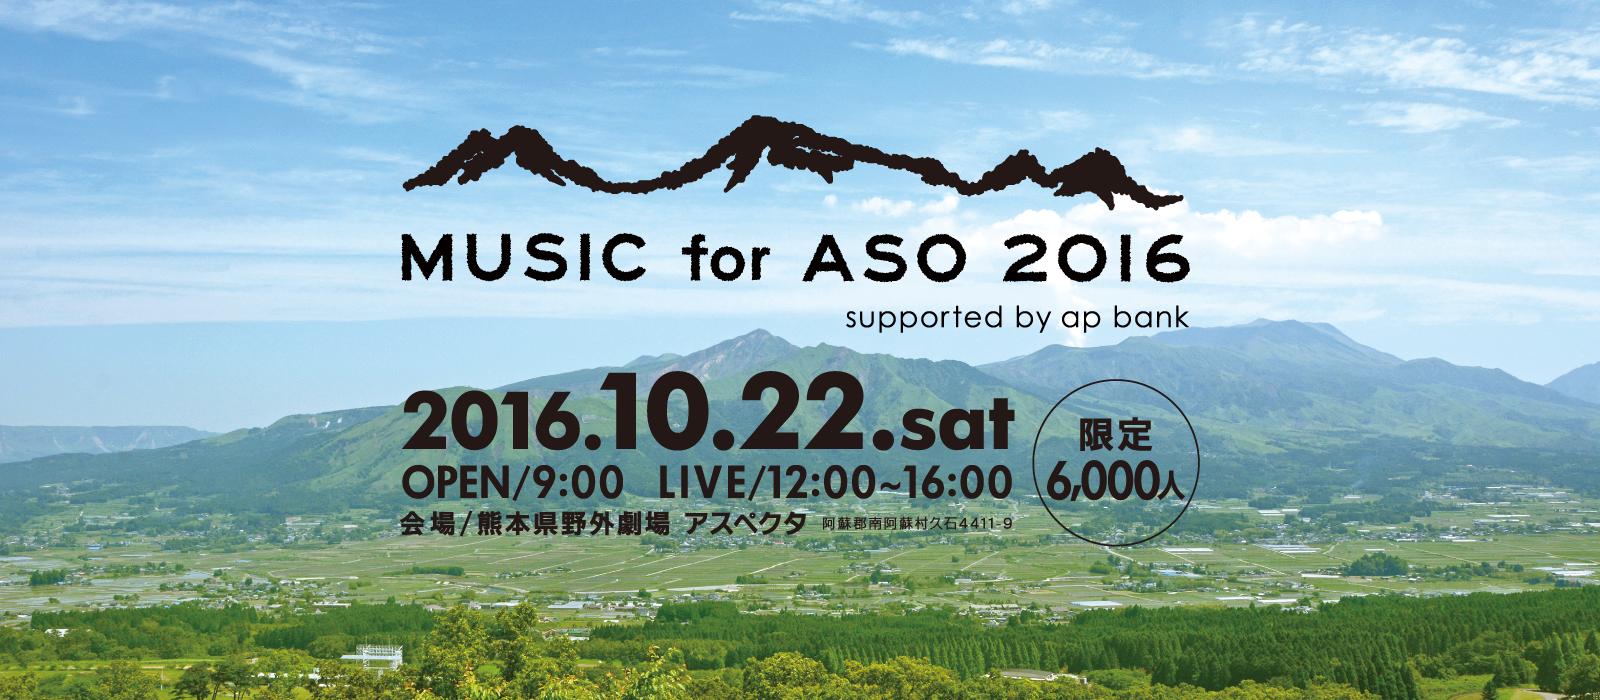 【MUSIC for ASO】阿蘇ミュージック!アーティストが集結